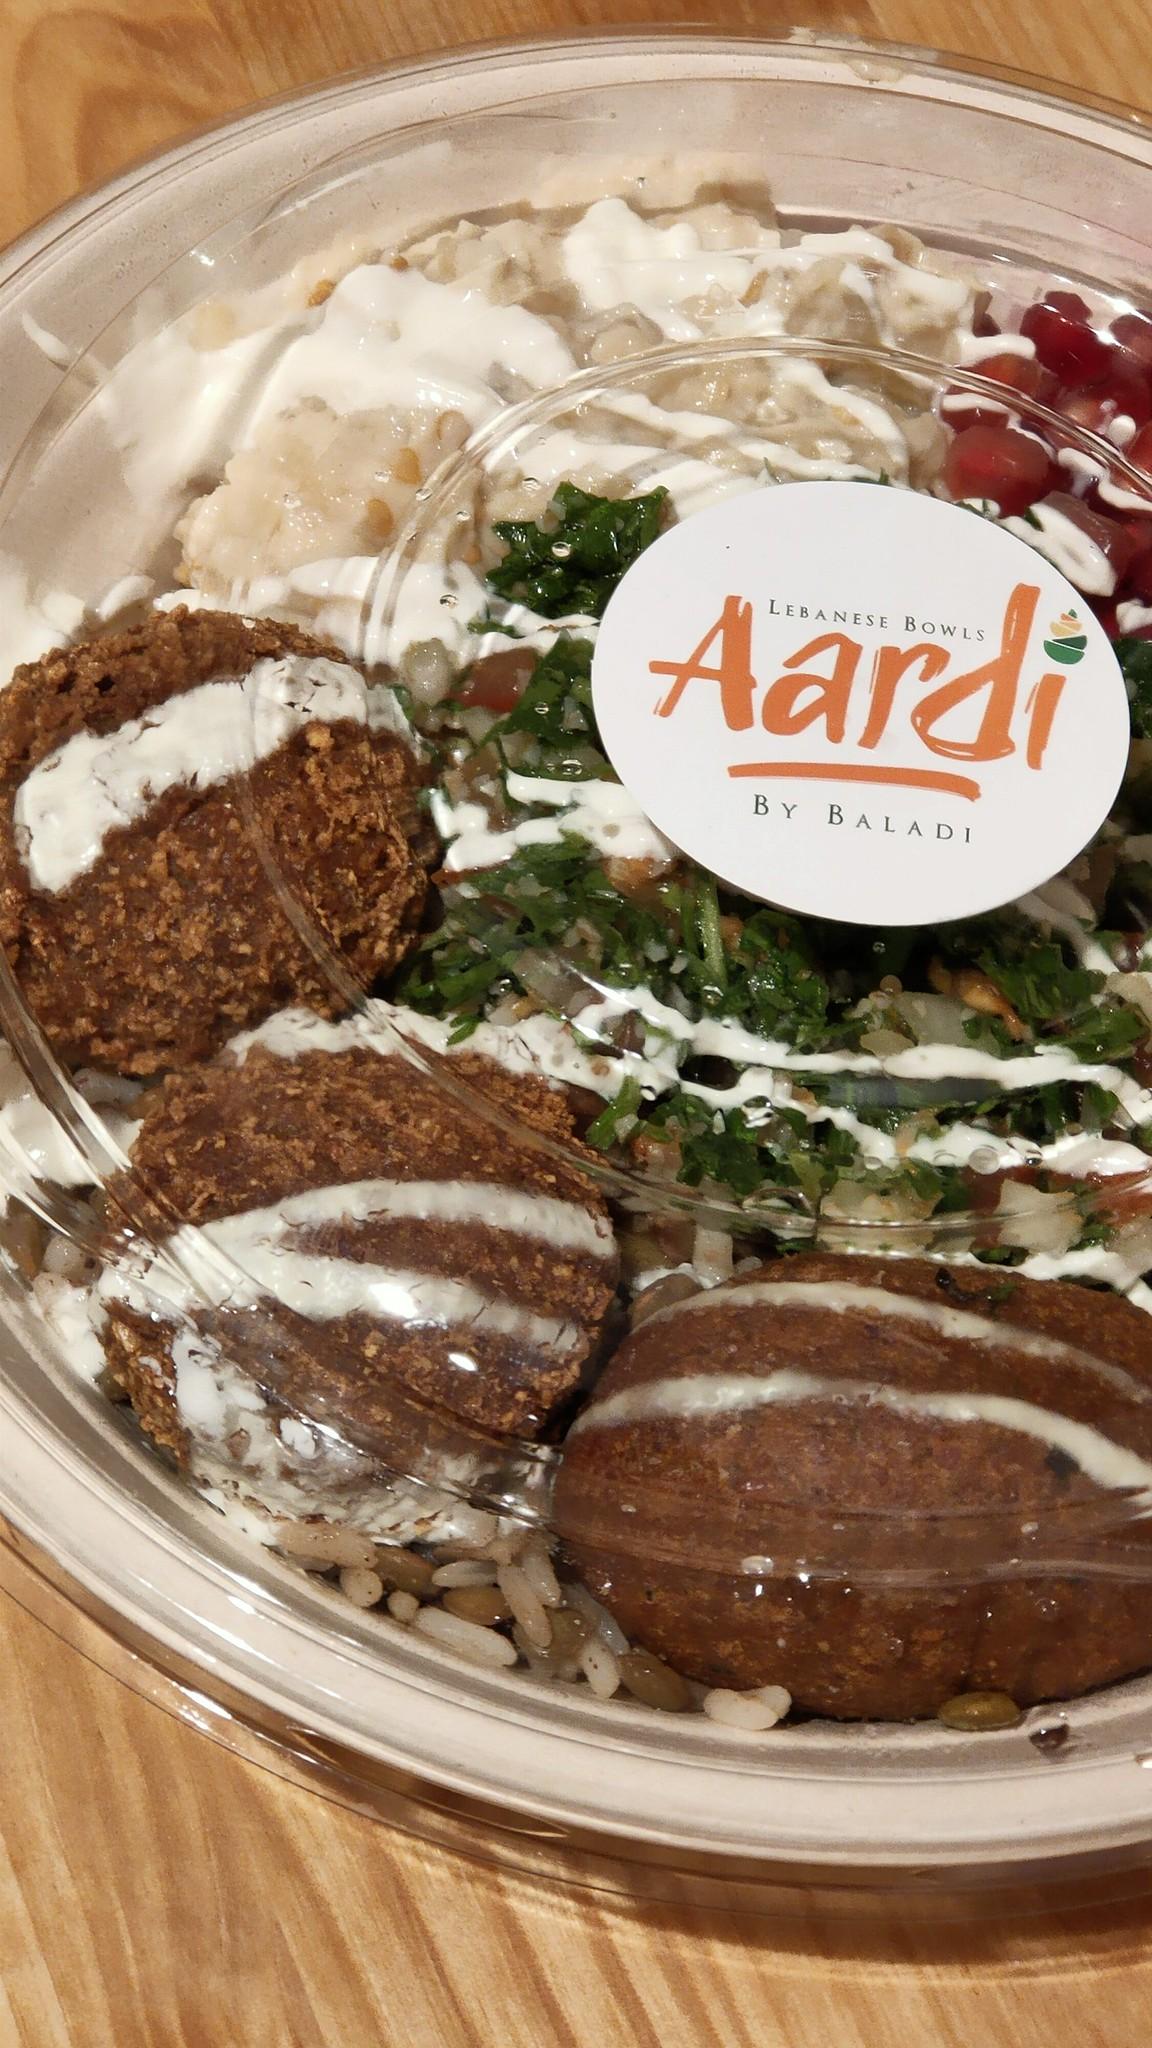 Aardi bowl